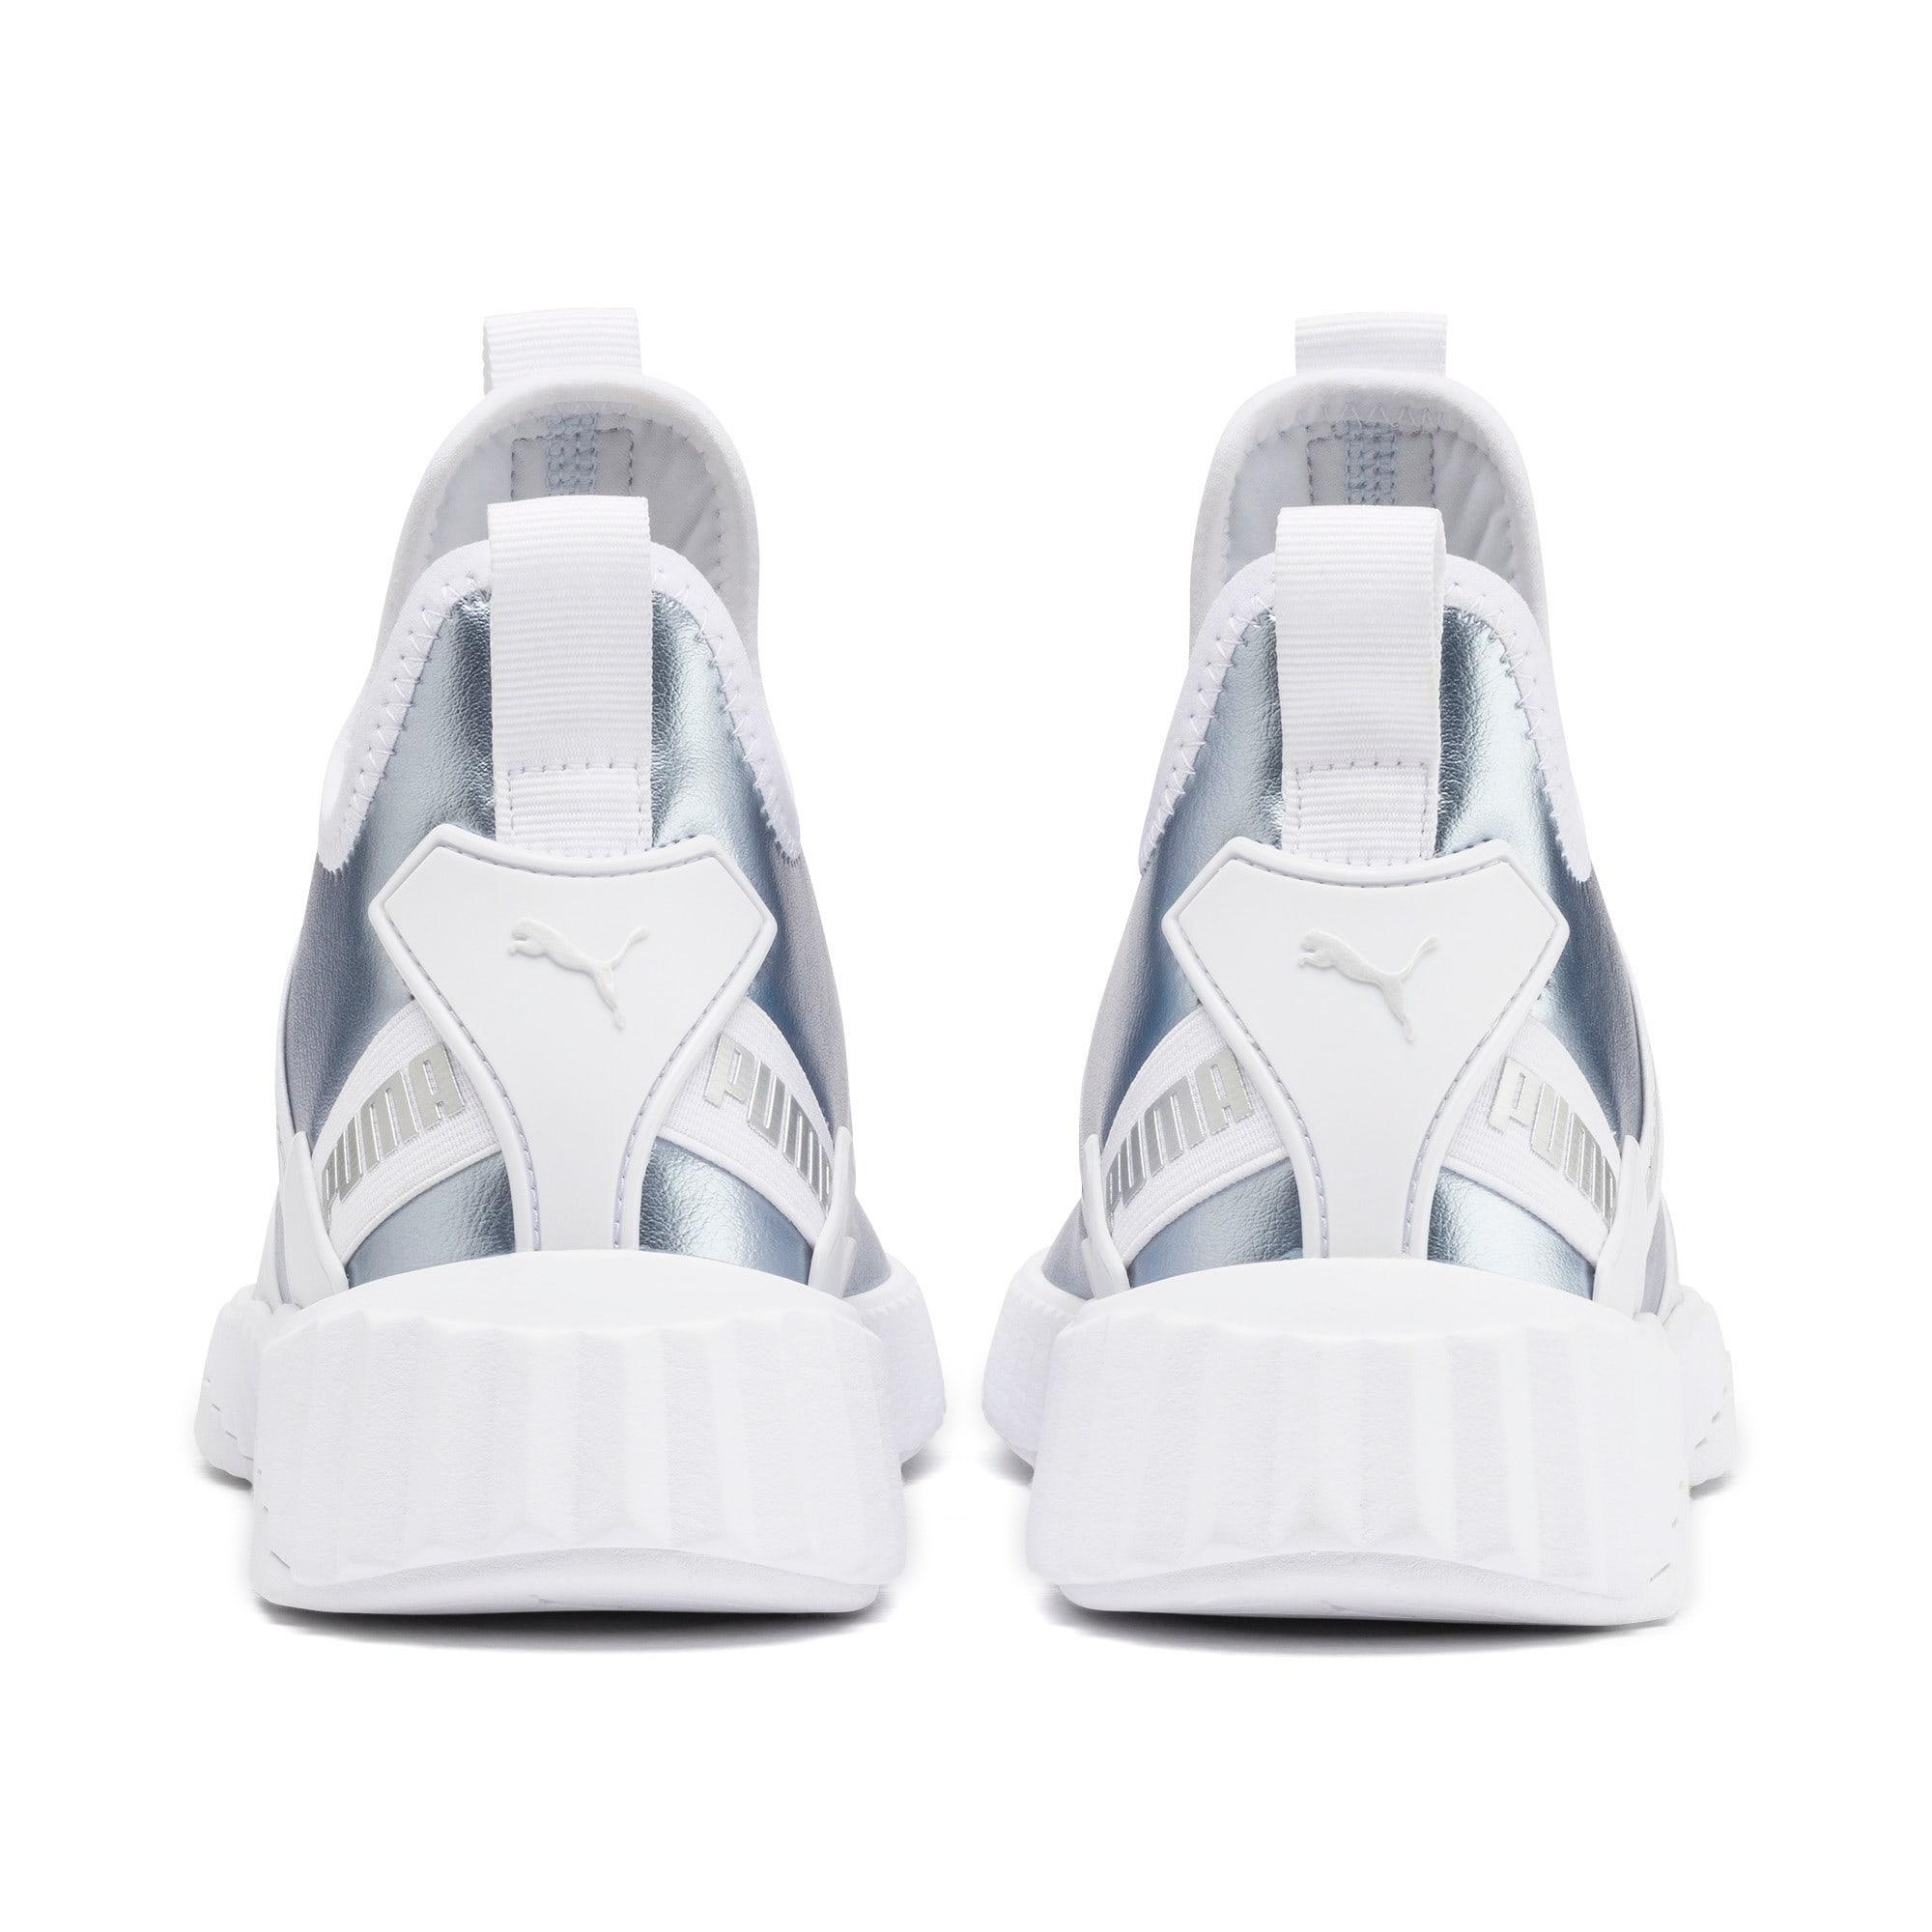 Thumbnail 4 of Defy Mid Metallic Women's Training Shoes, Heather-Puma White, medium